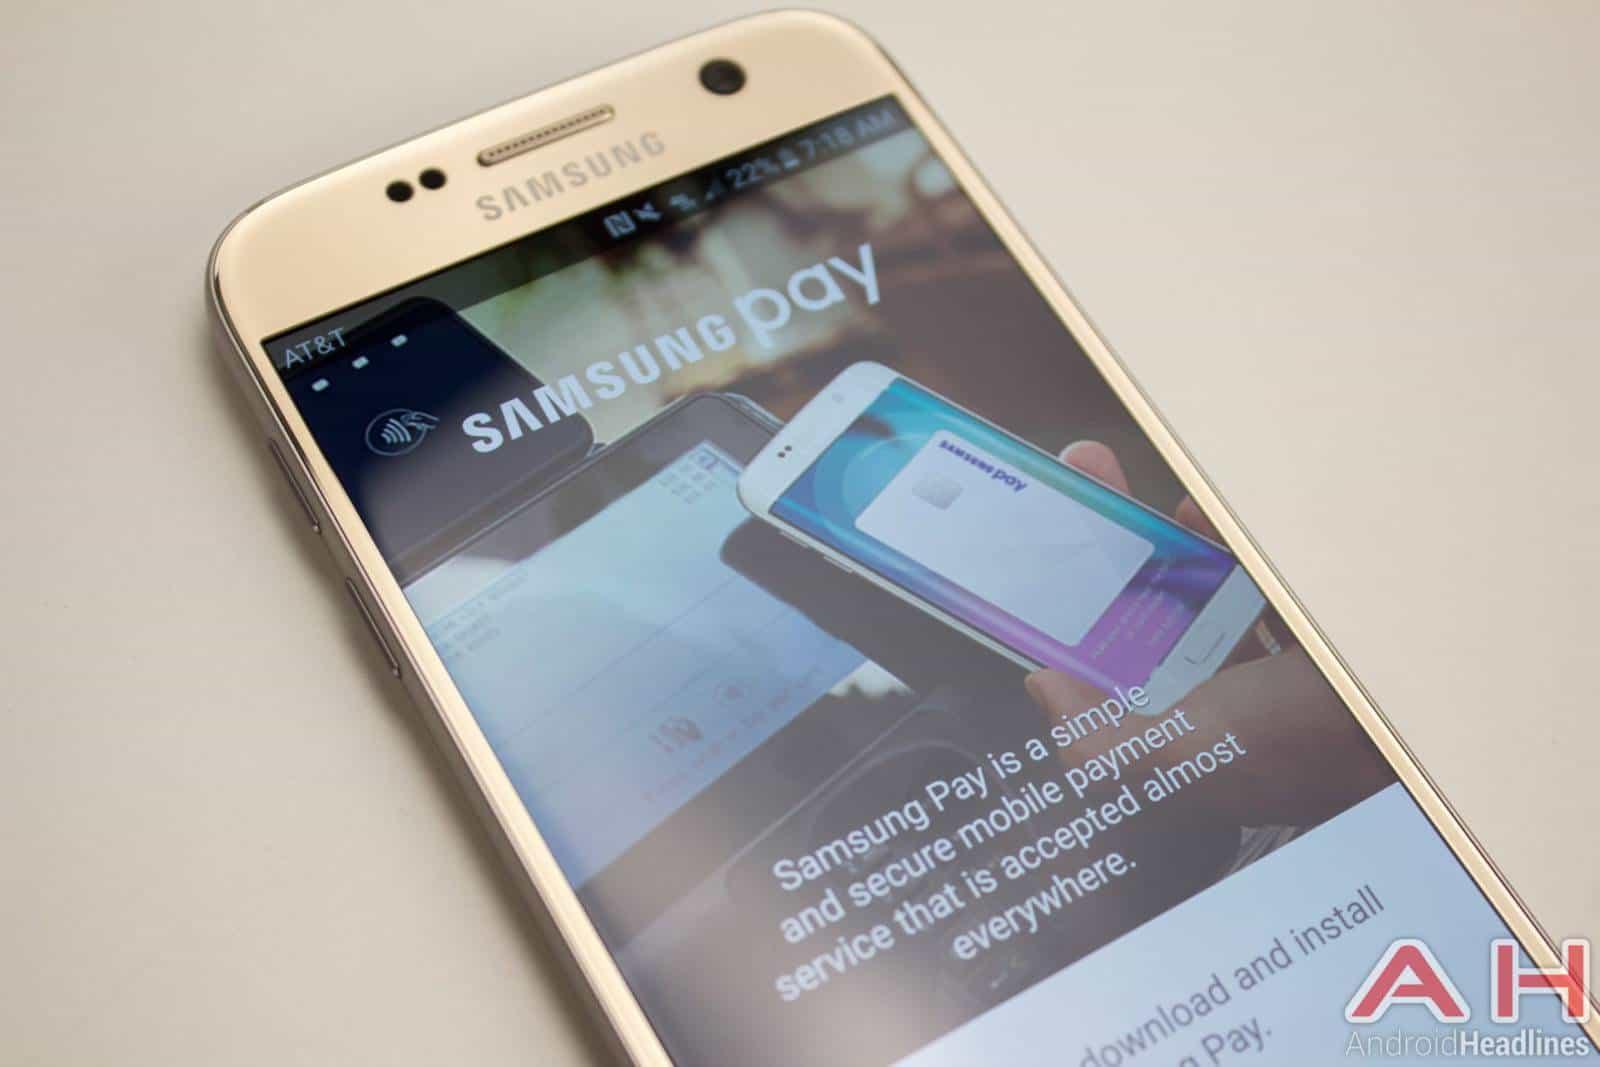 Samsung Details Samsung Pay Expansion & ATM Use In Korea ...